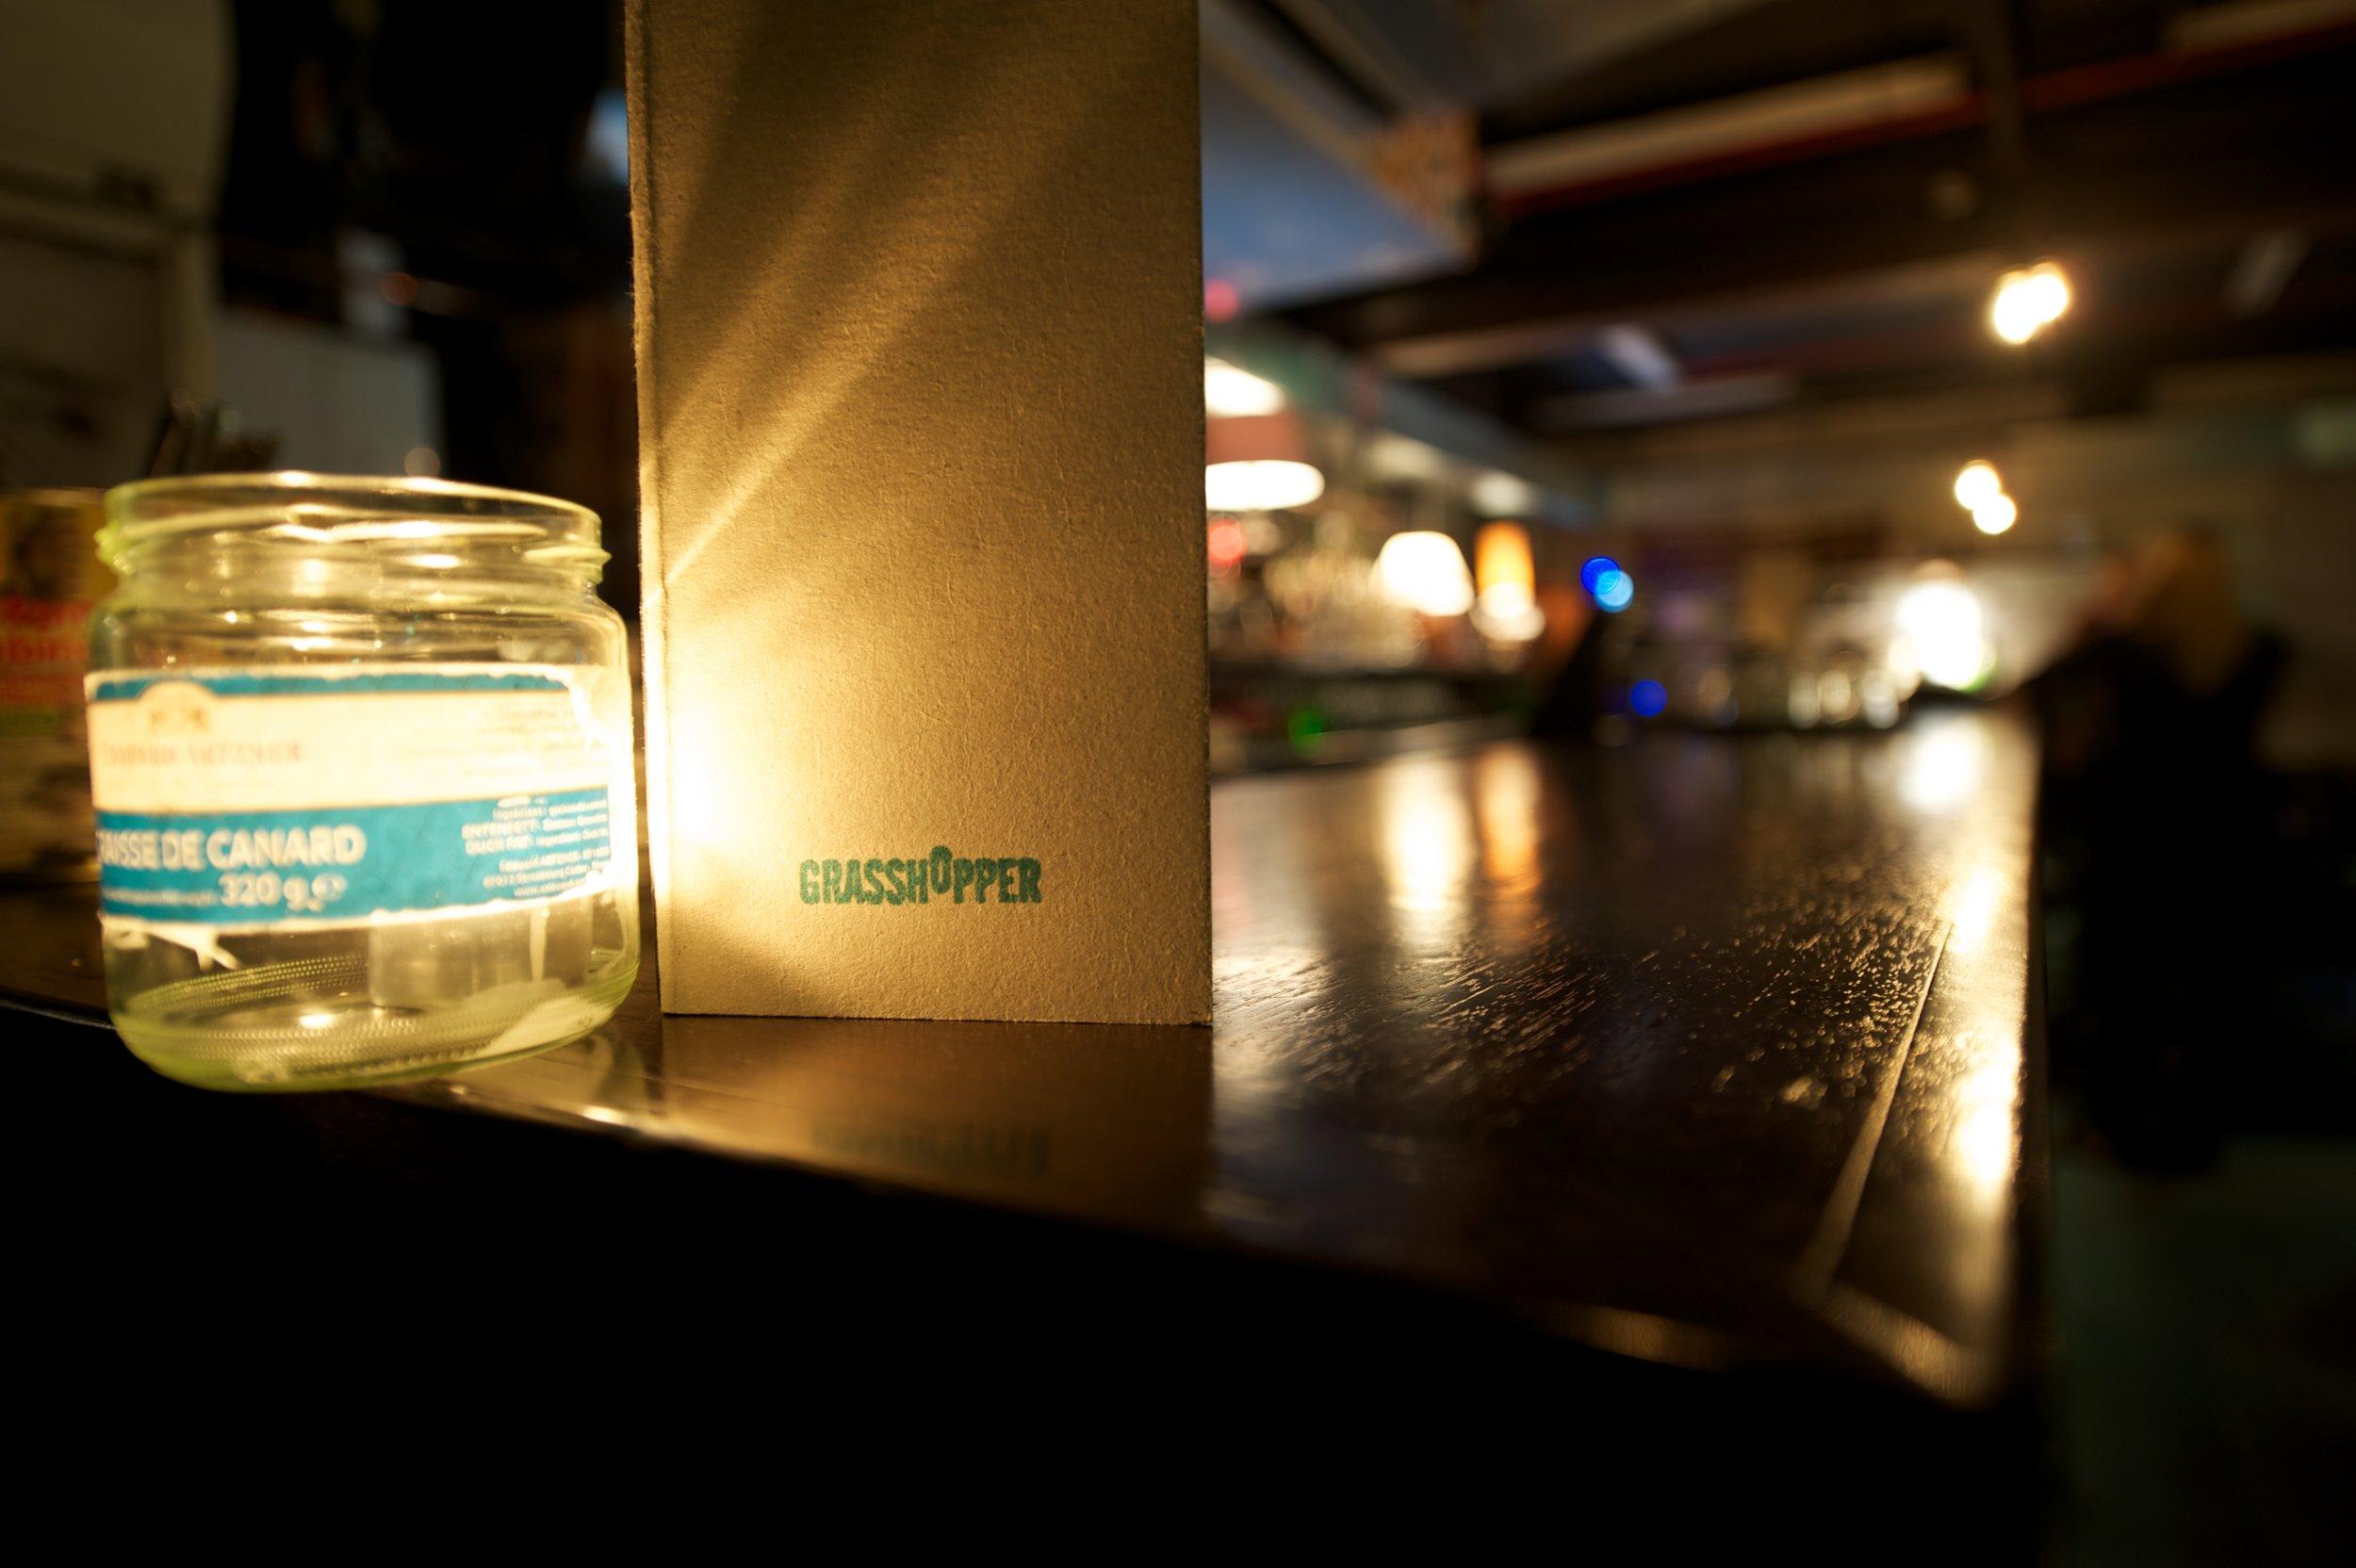 grasshopper bar logo and jar.jpeg